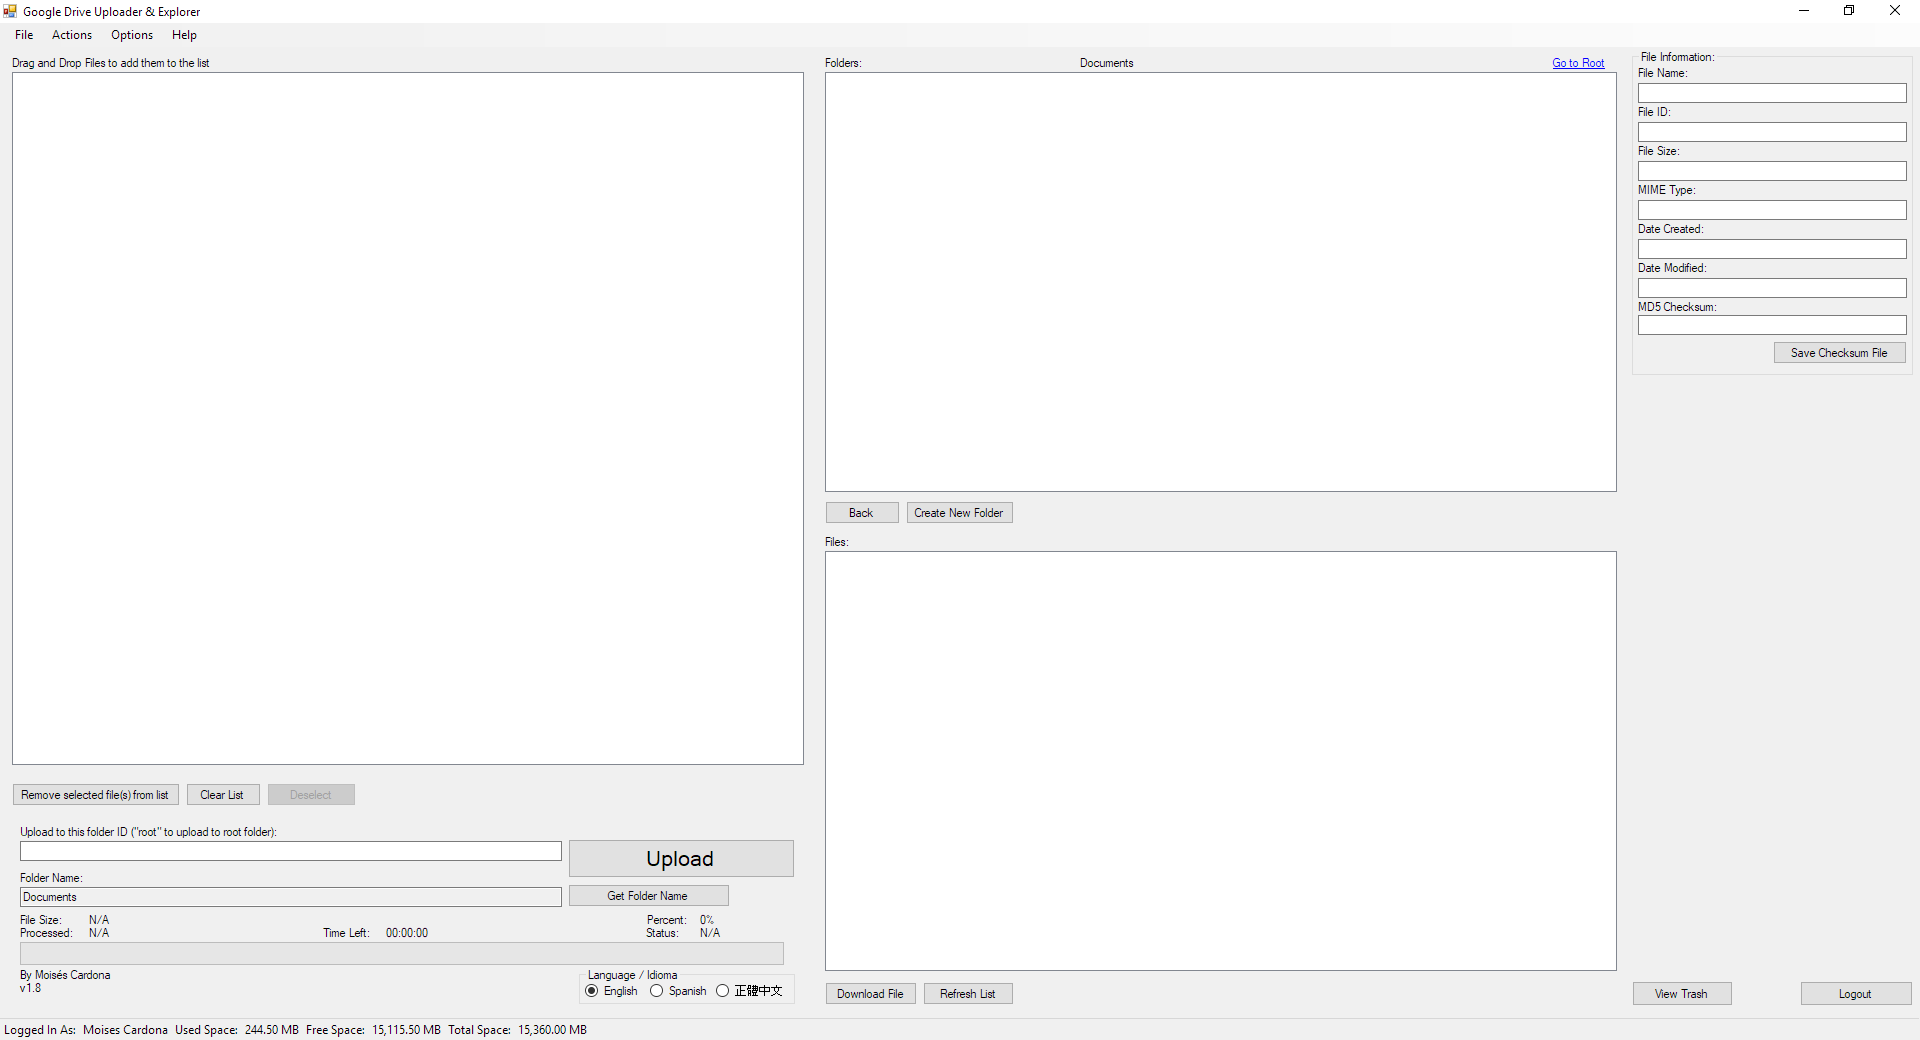 Google Drive Upload Tool v1.8 - 7